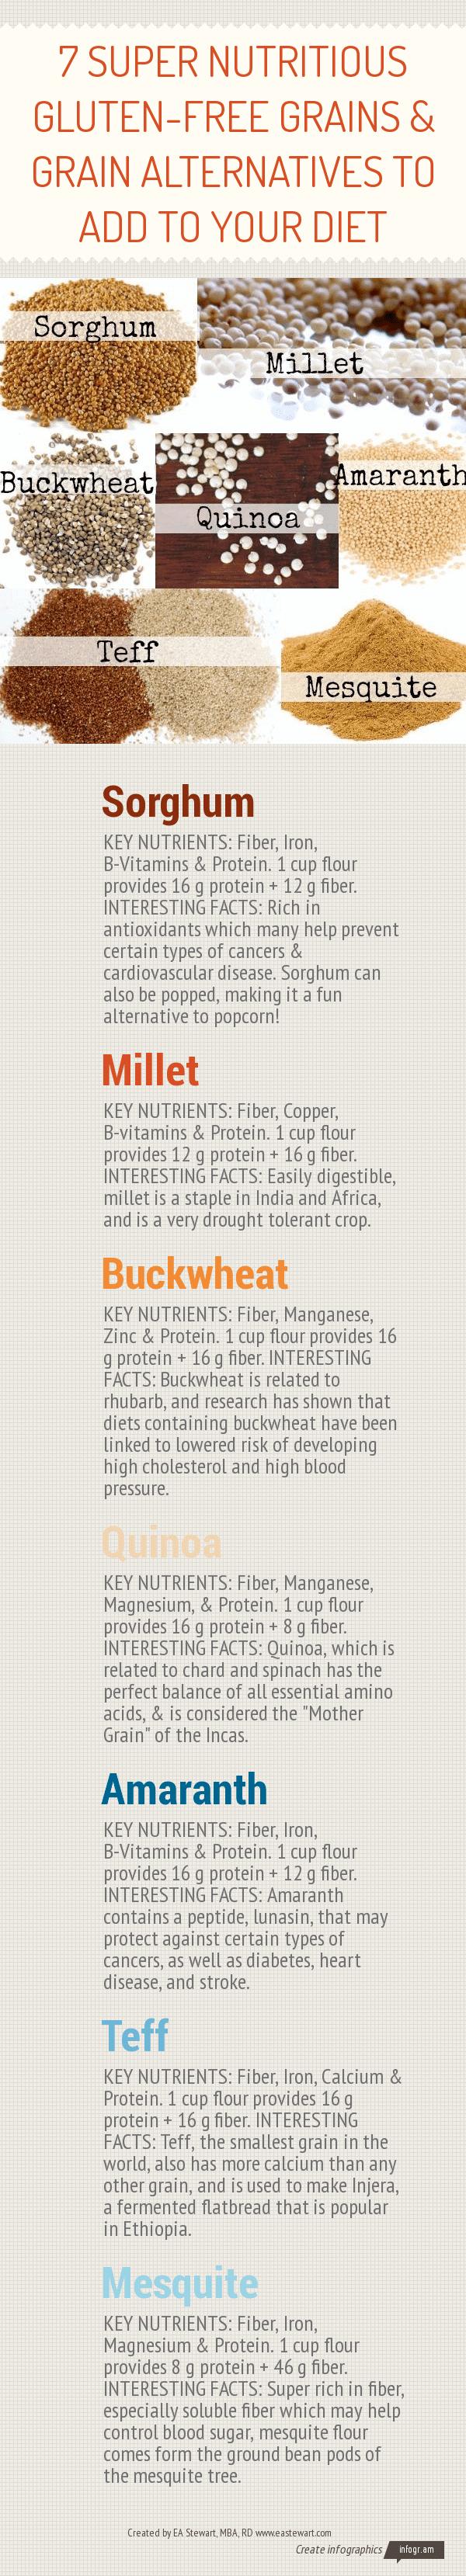 7 Super Nutritious Gluten-Free Grains and Grain Alternatives